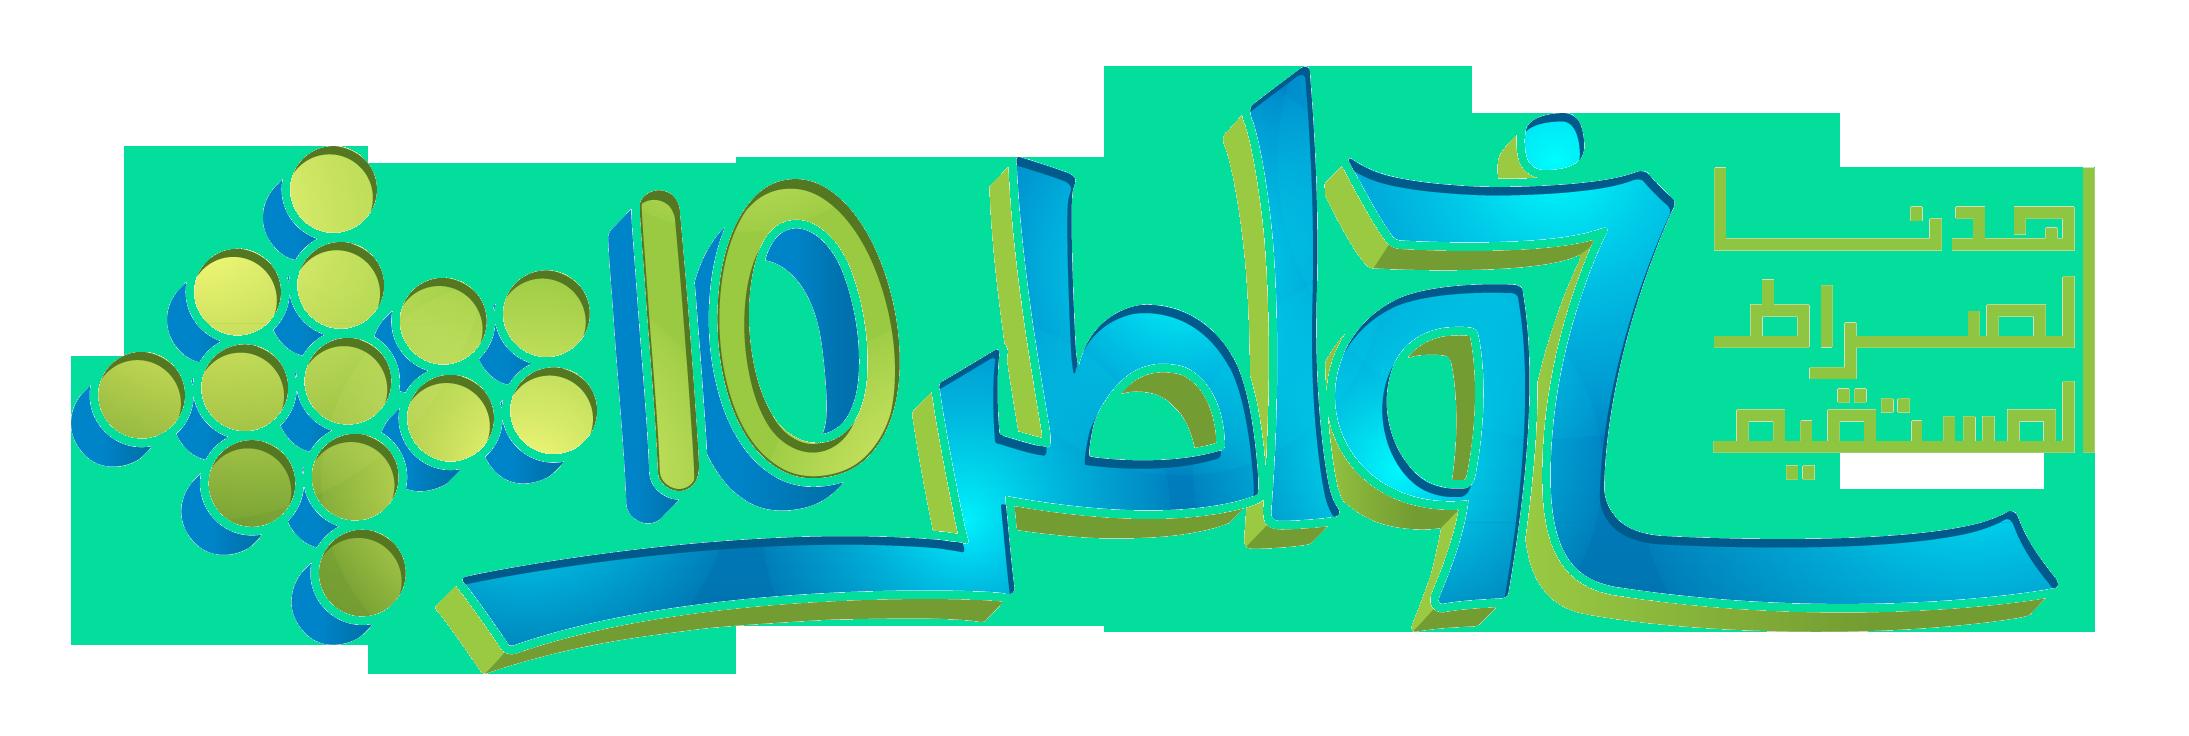 Khawater 10 logo